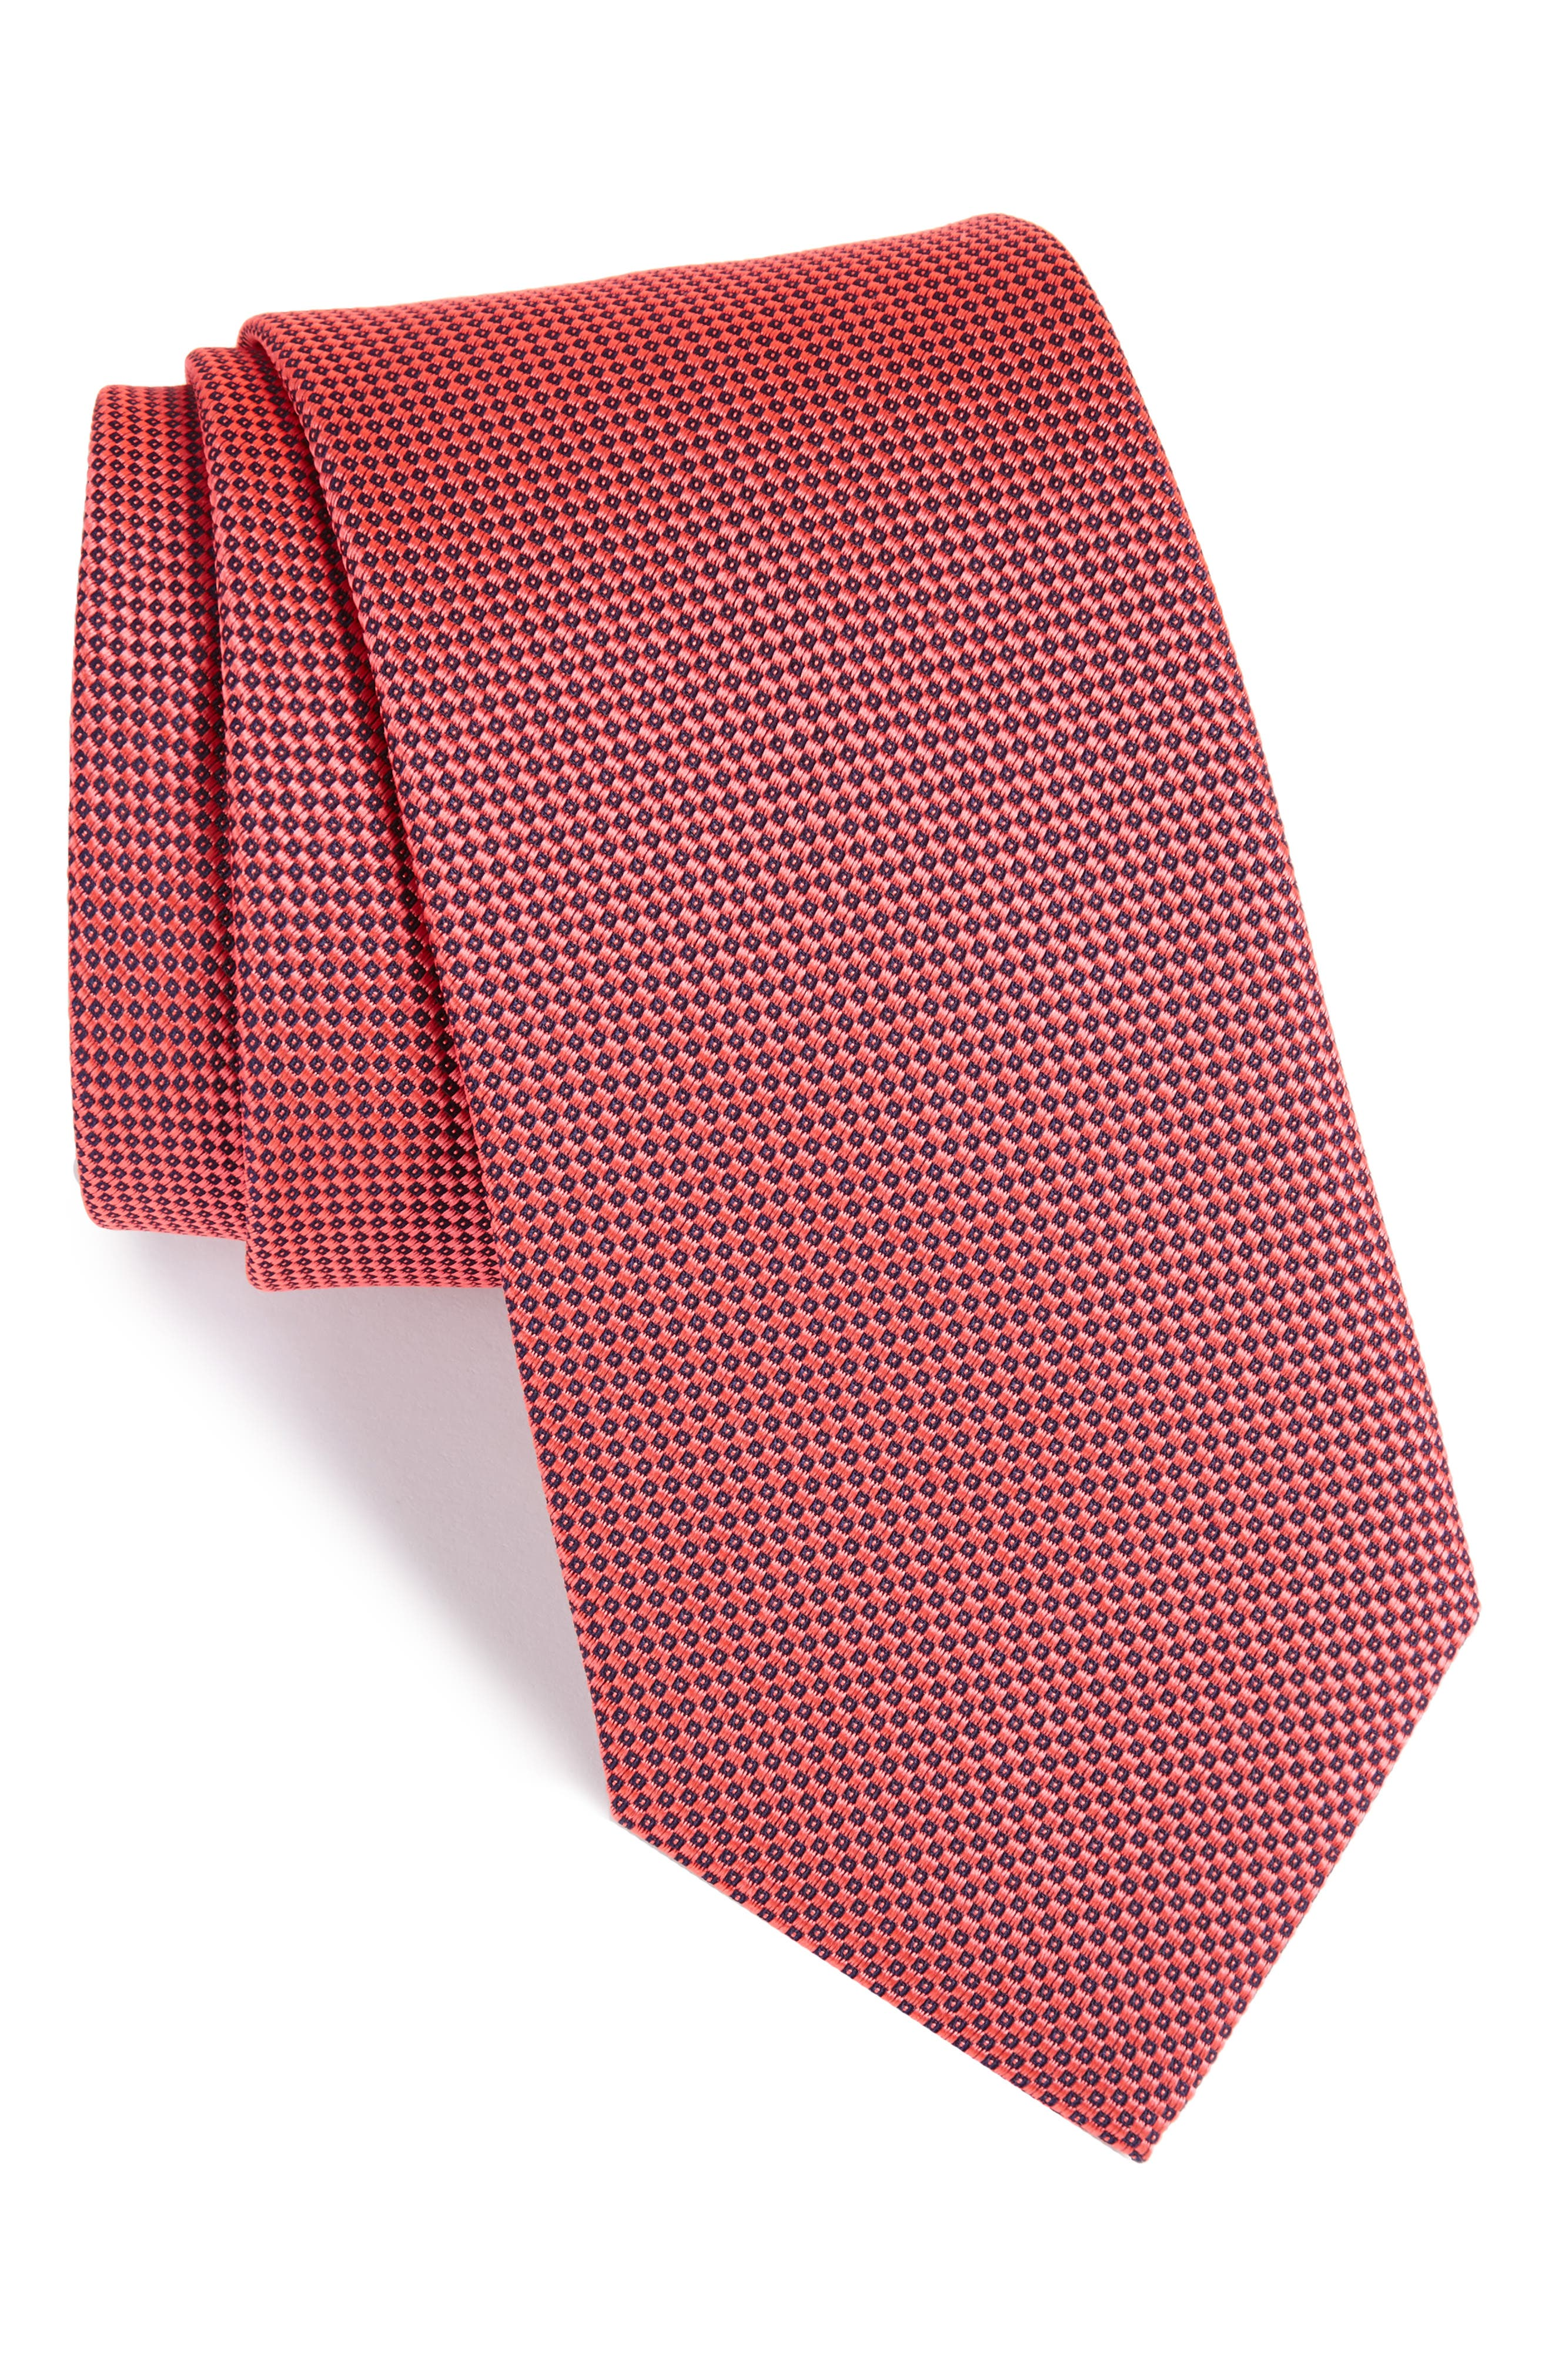 Main Image - Eton Solid Silk Tie